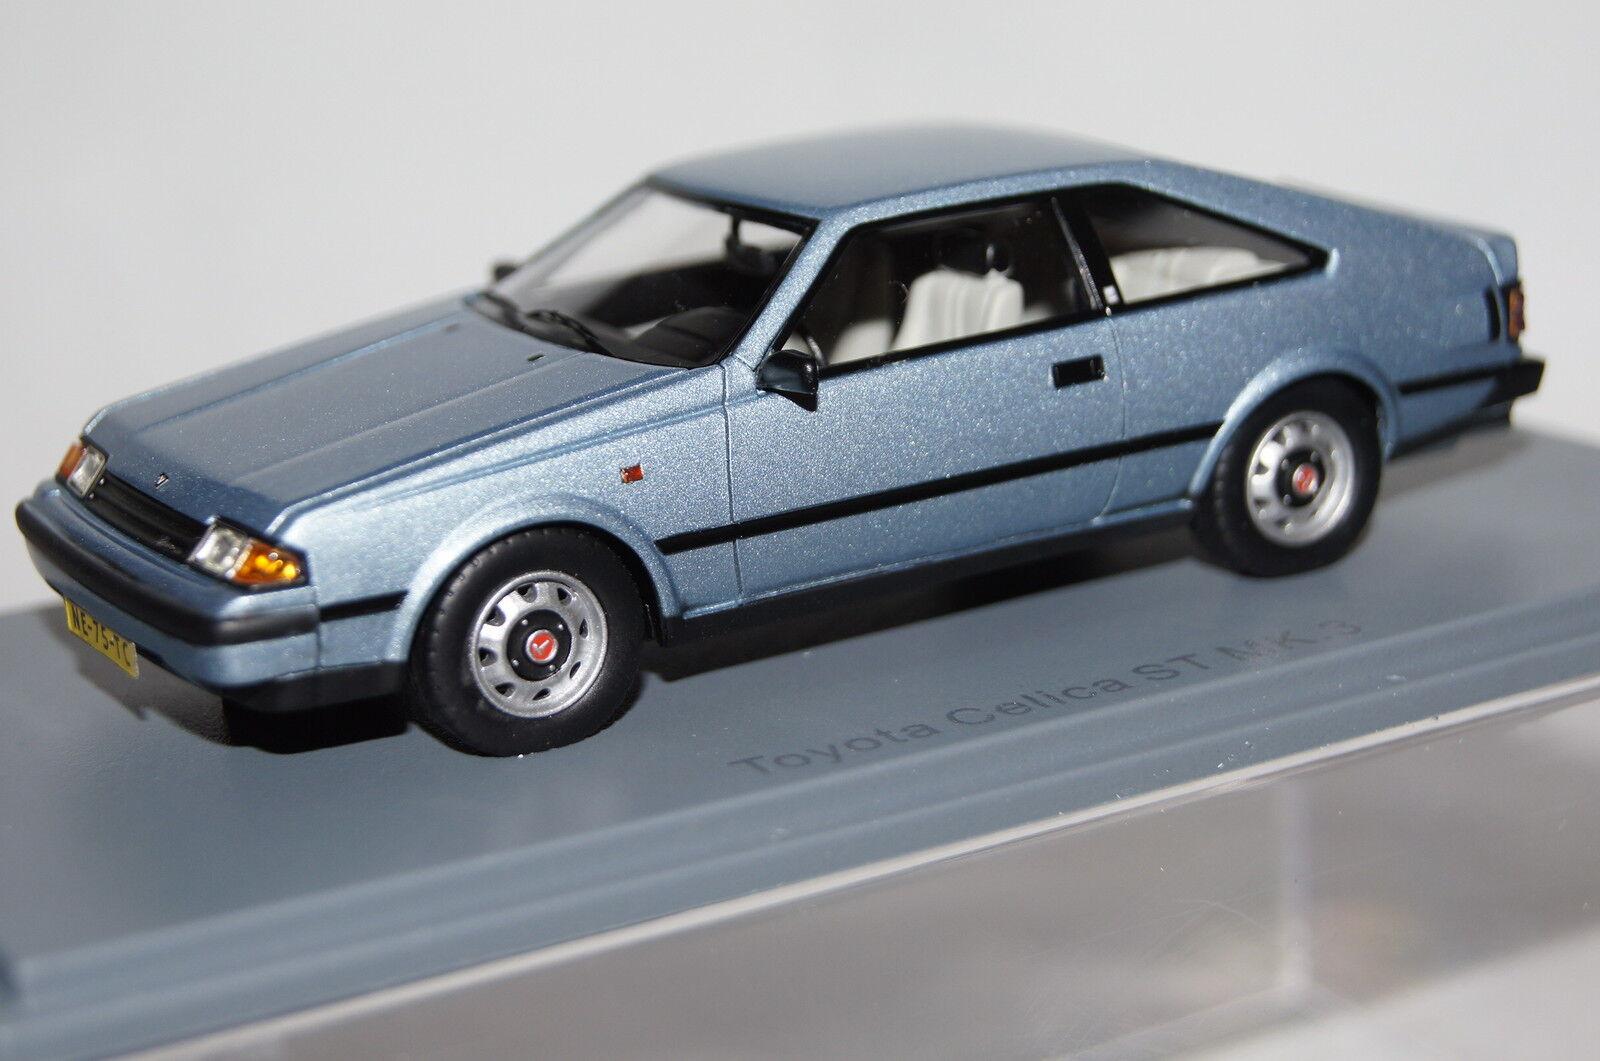 Toyota Celica St mk3 blu claro metalizado 1 43 neo nuevo & OVP 43775